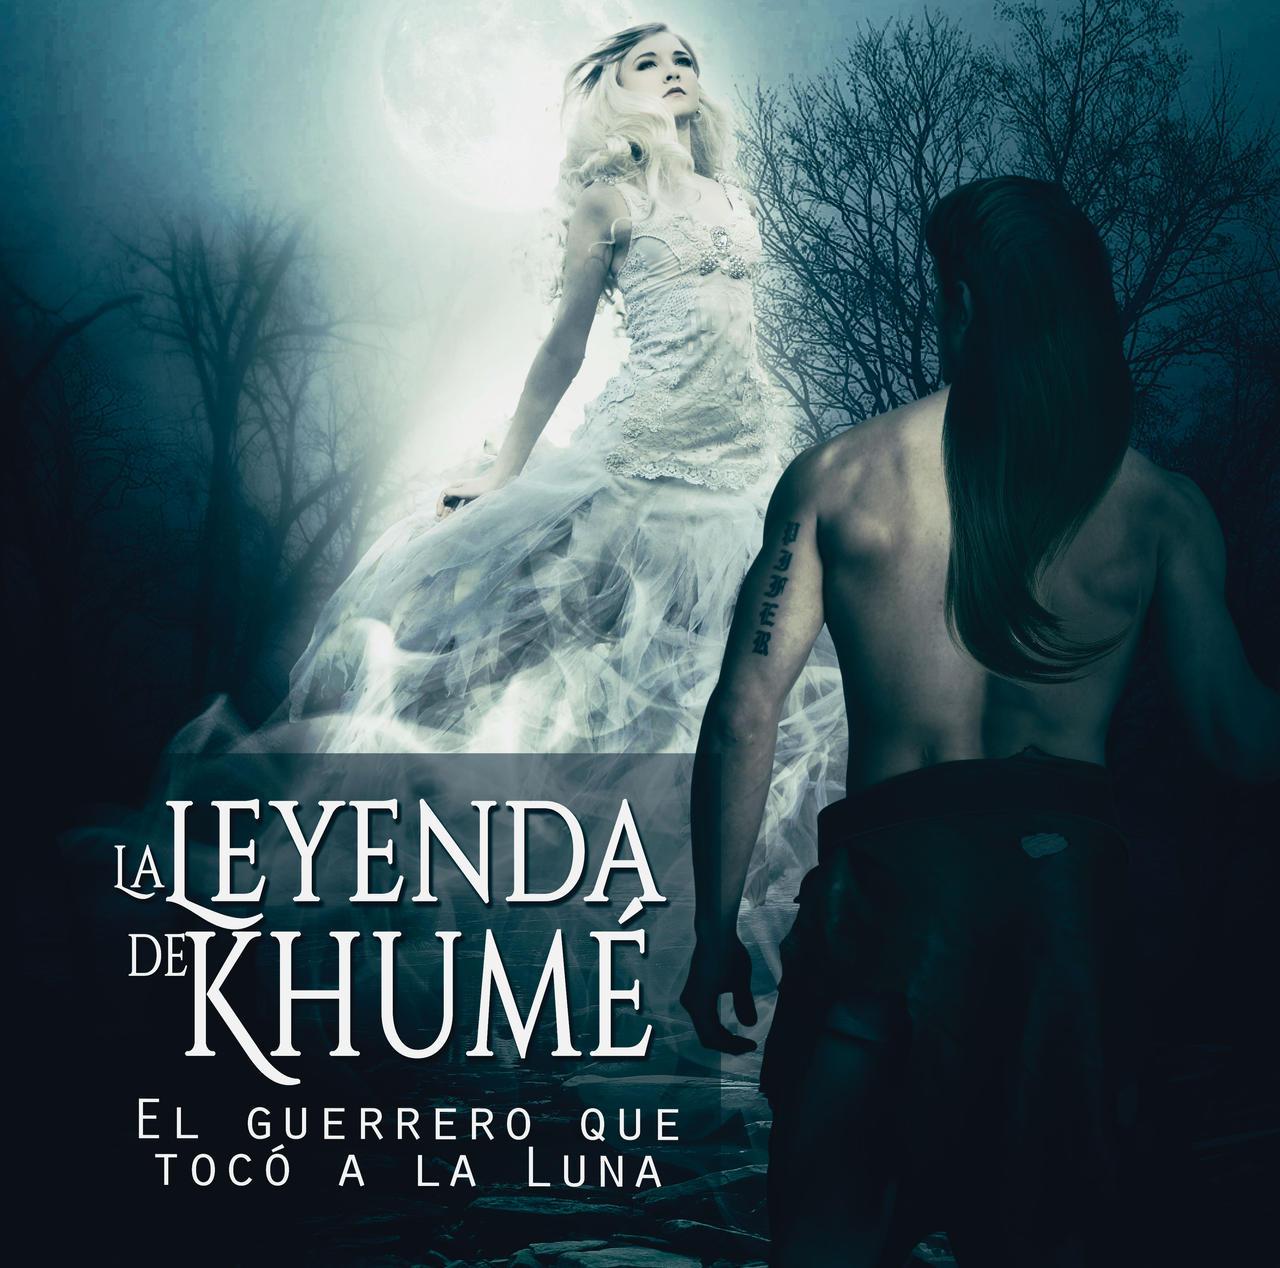 Leyenda de Khume